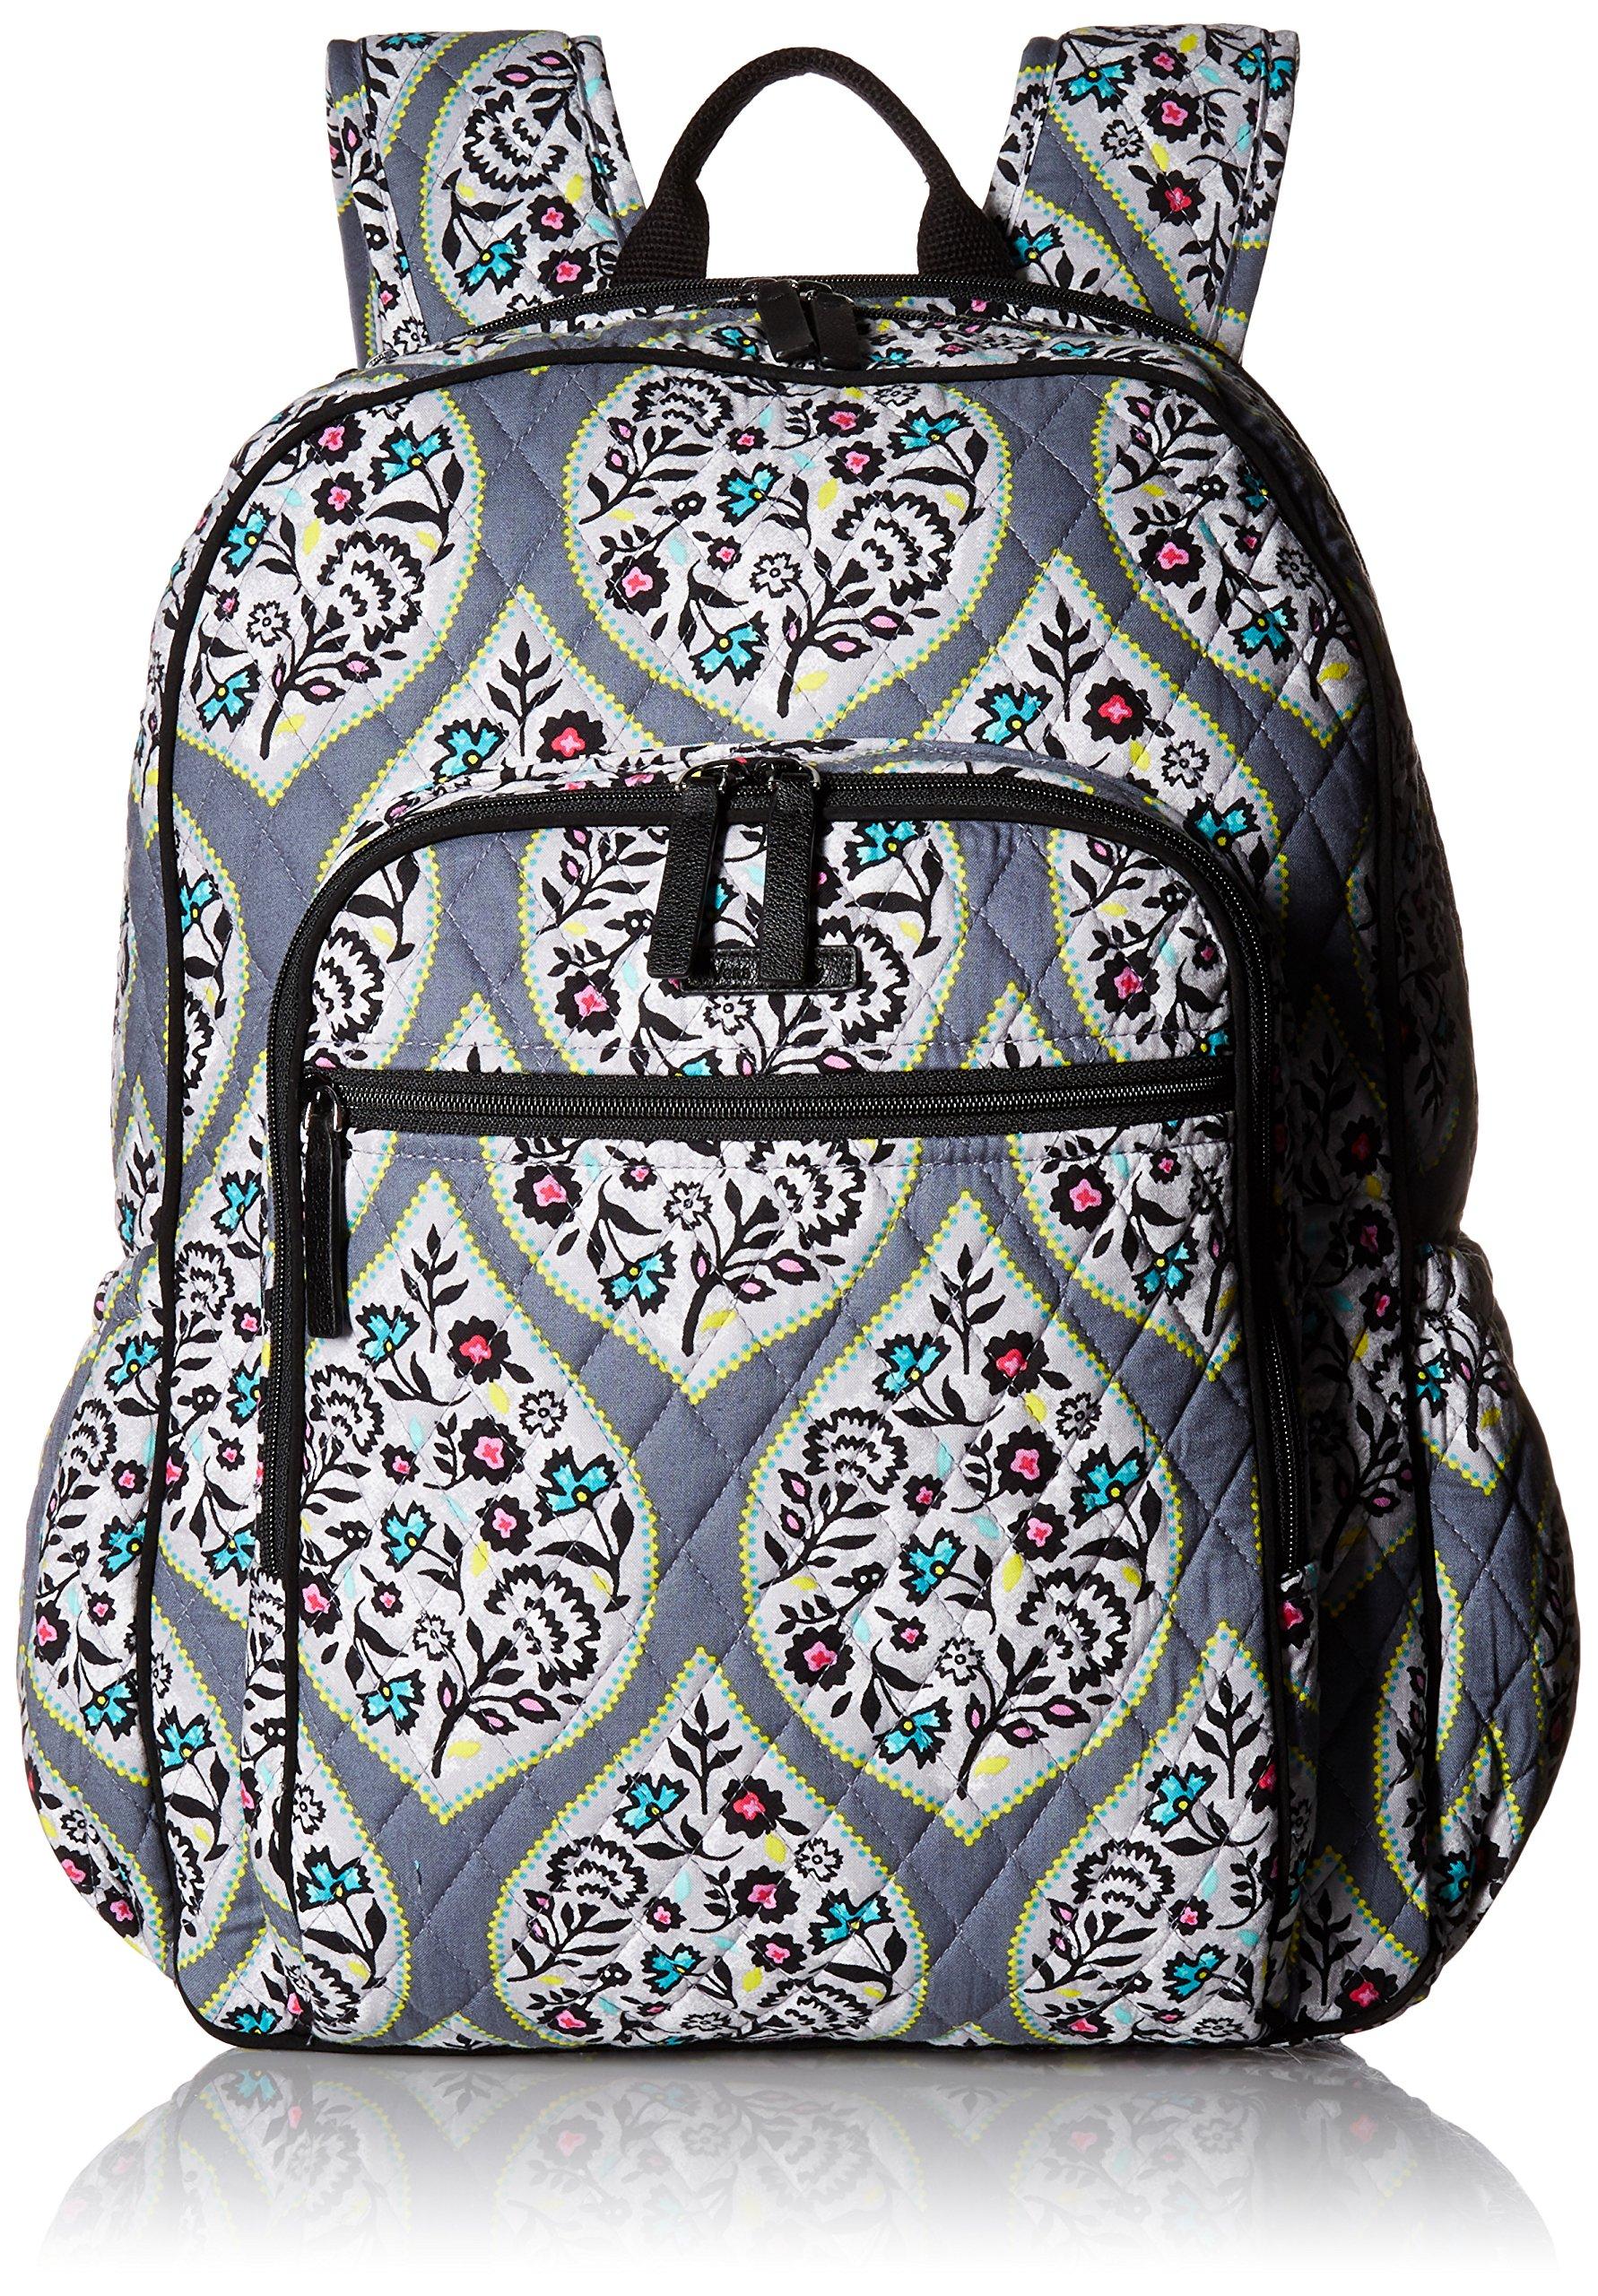 Vera Bradley Women's Campus Tech Backpack-Signature, Heritage Leaf